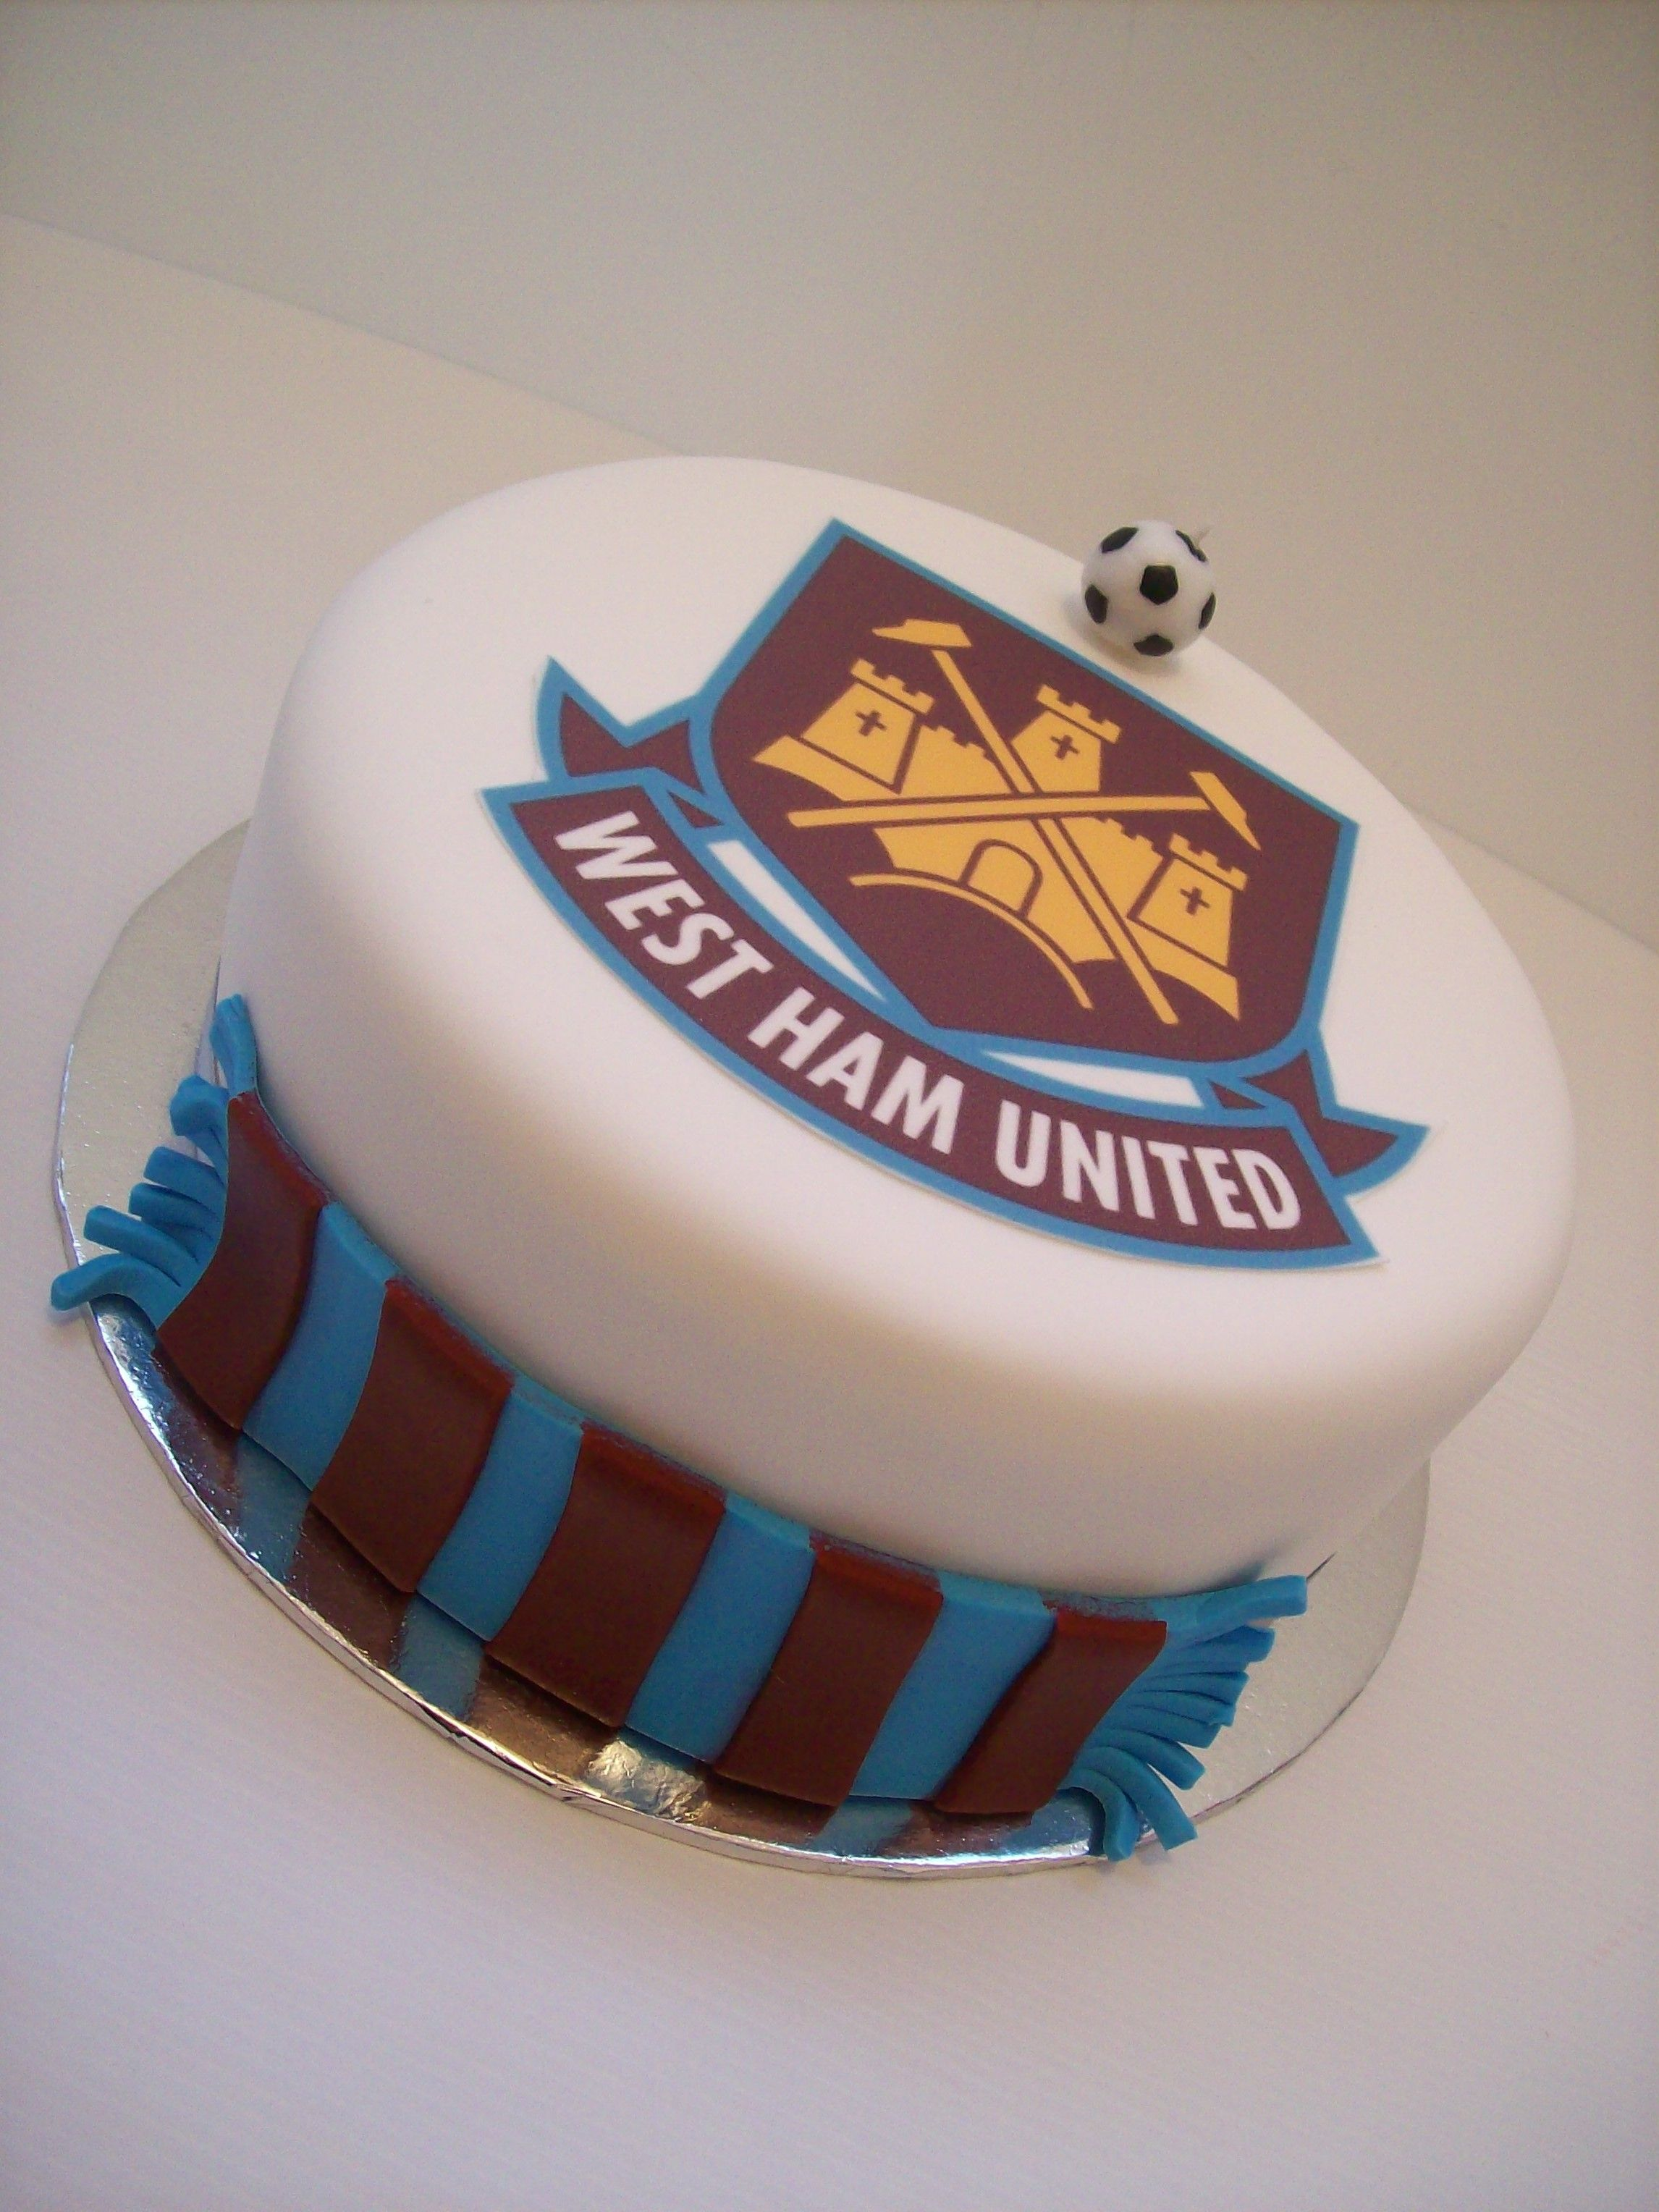 West Ham United Cake Auckland 129 Cake Is 8 Inch